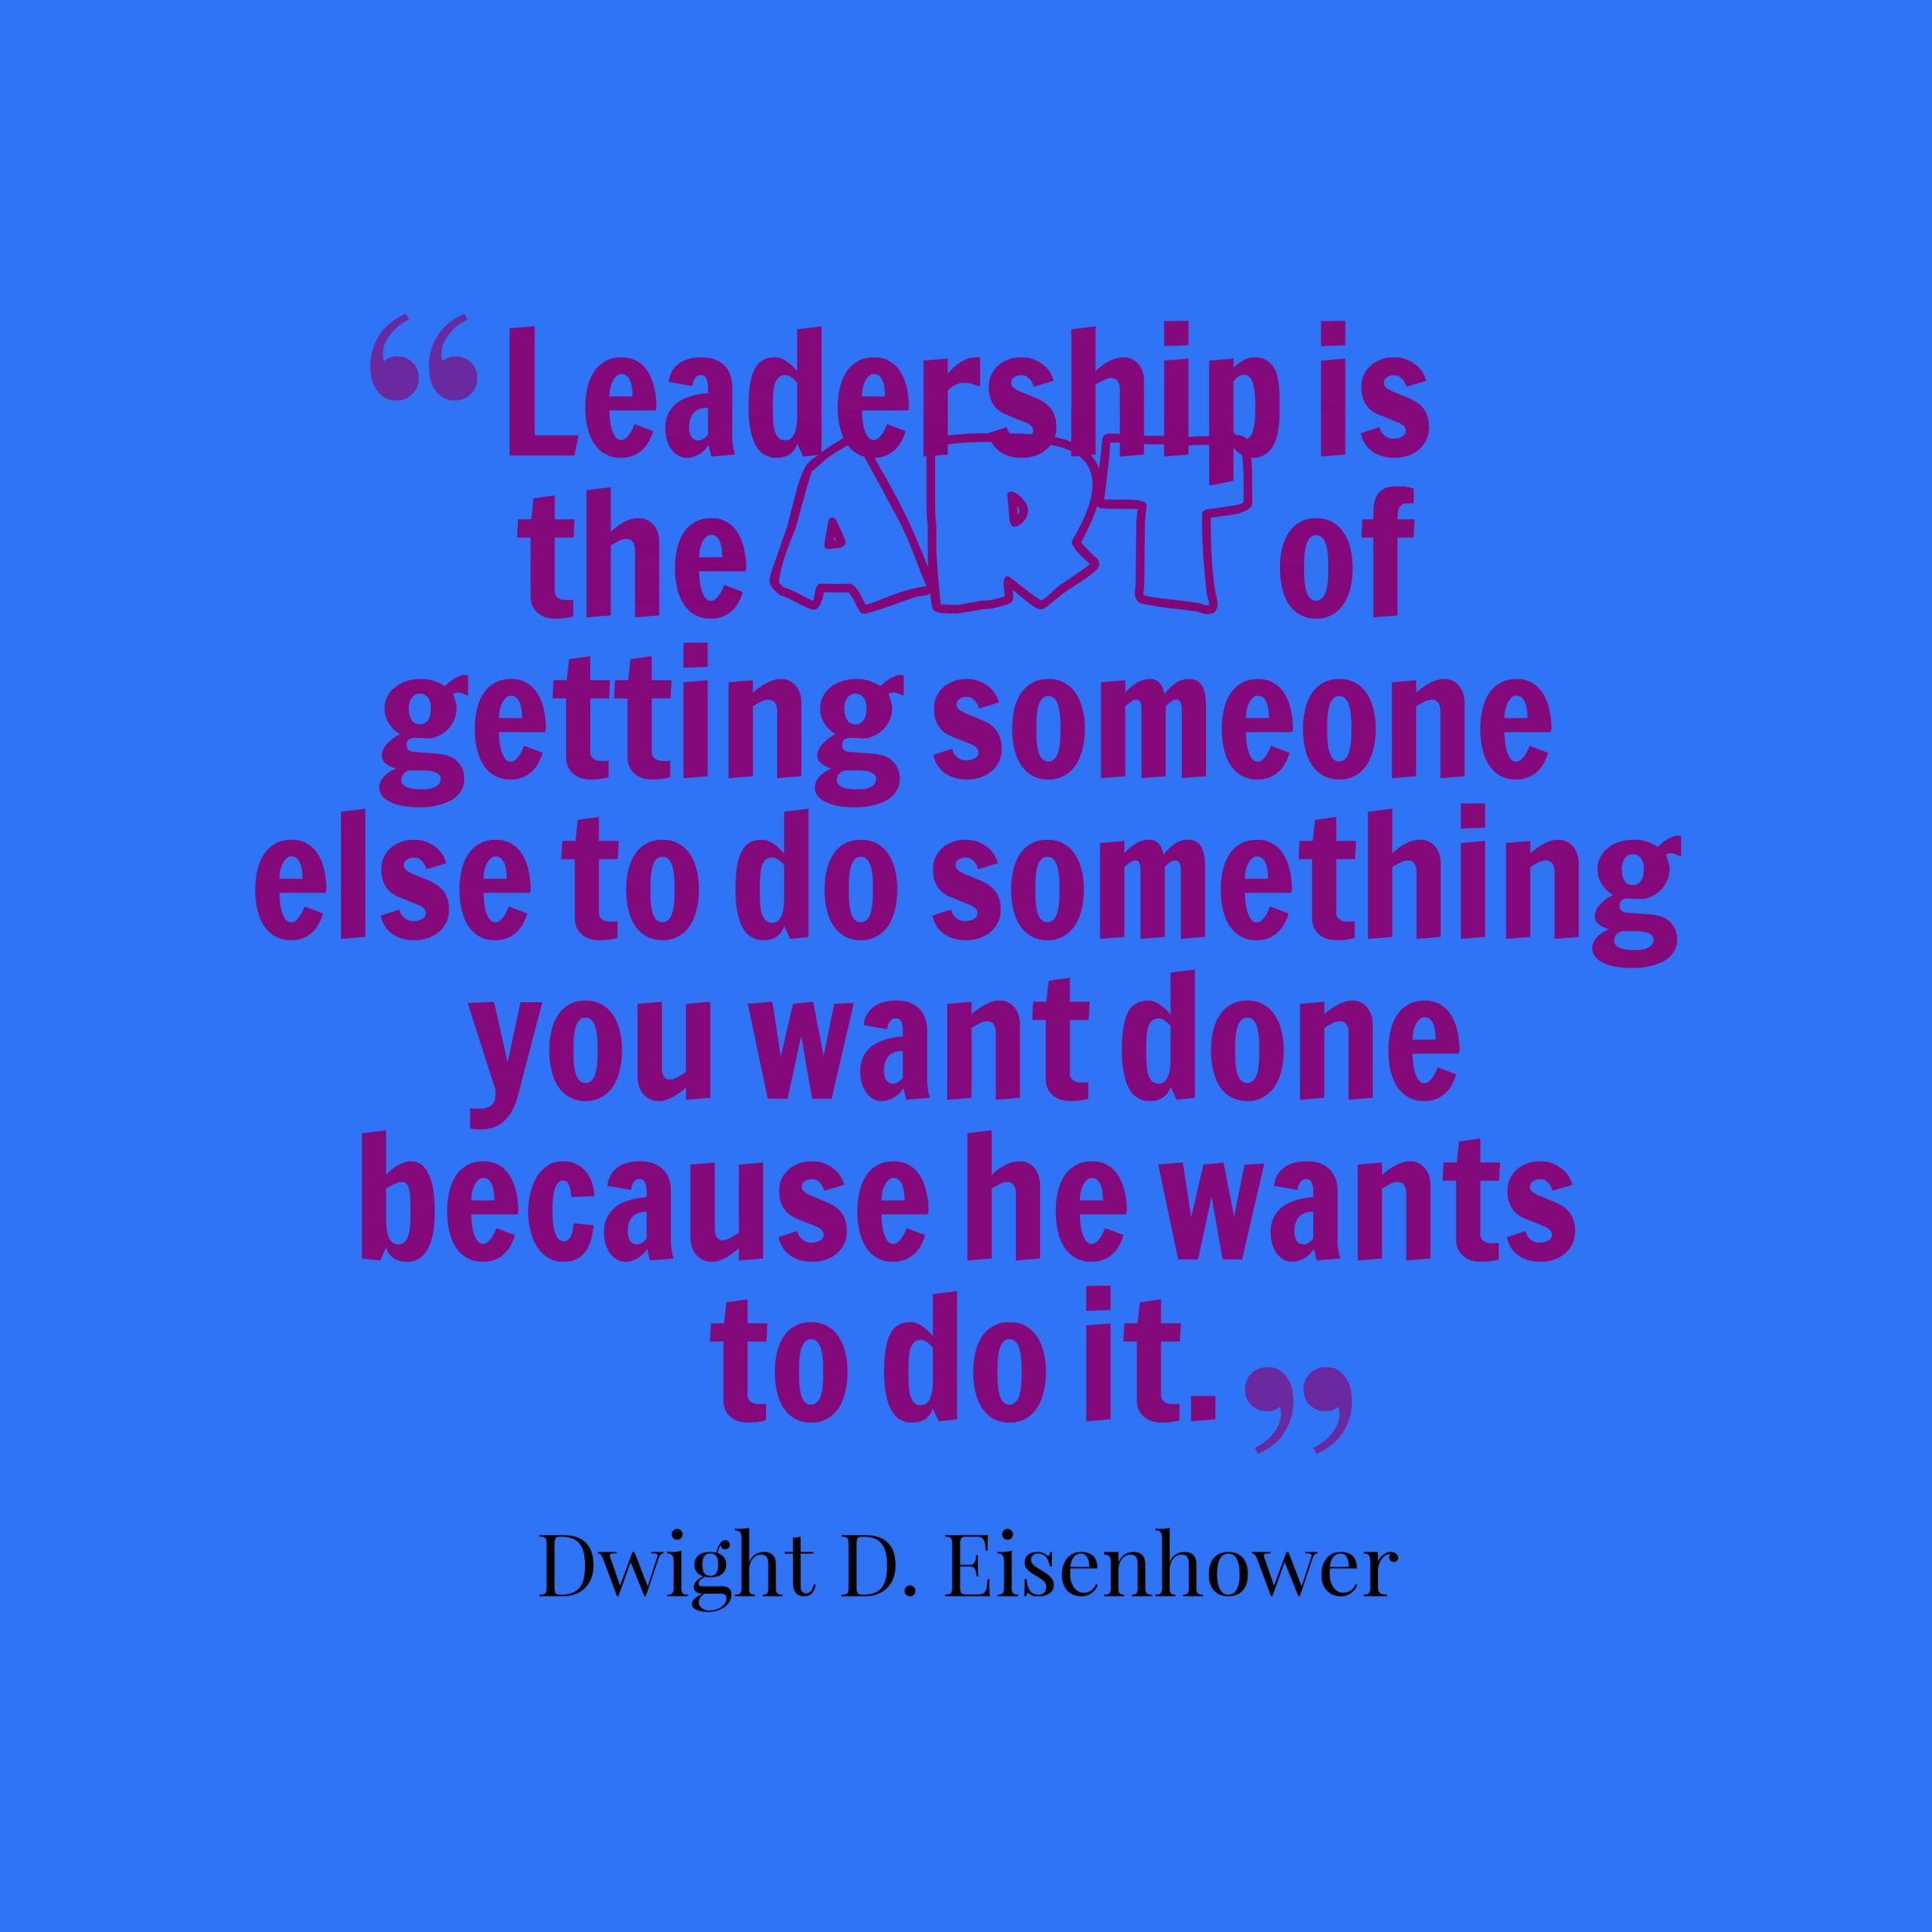 Eisenhower Leadership Quote  86 Best Dwight D Eisenhower Quotes